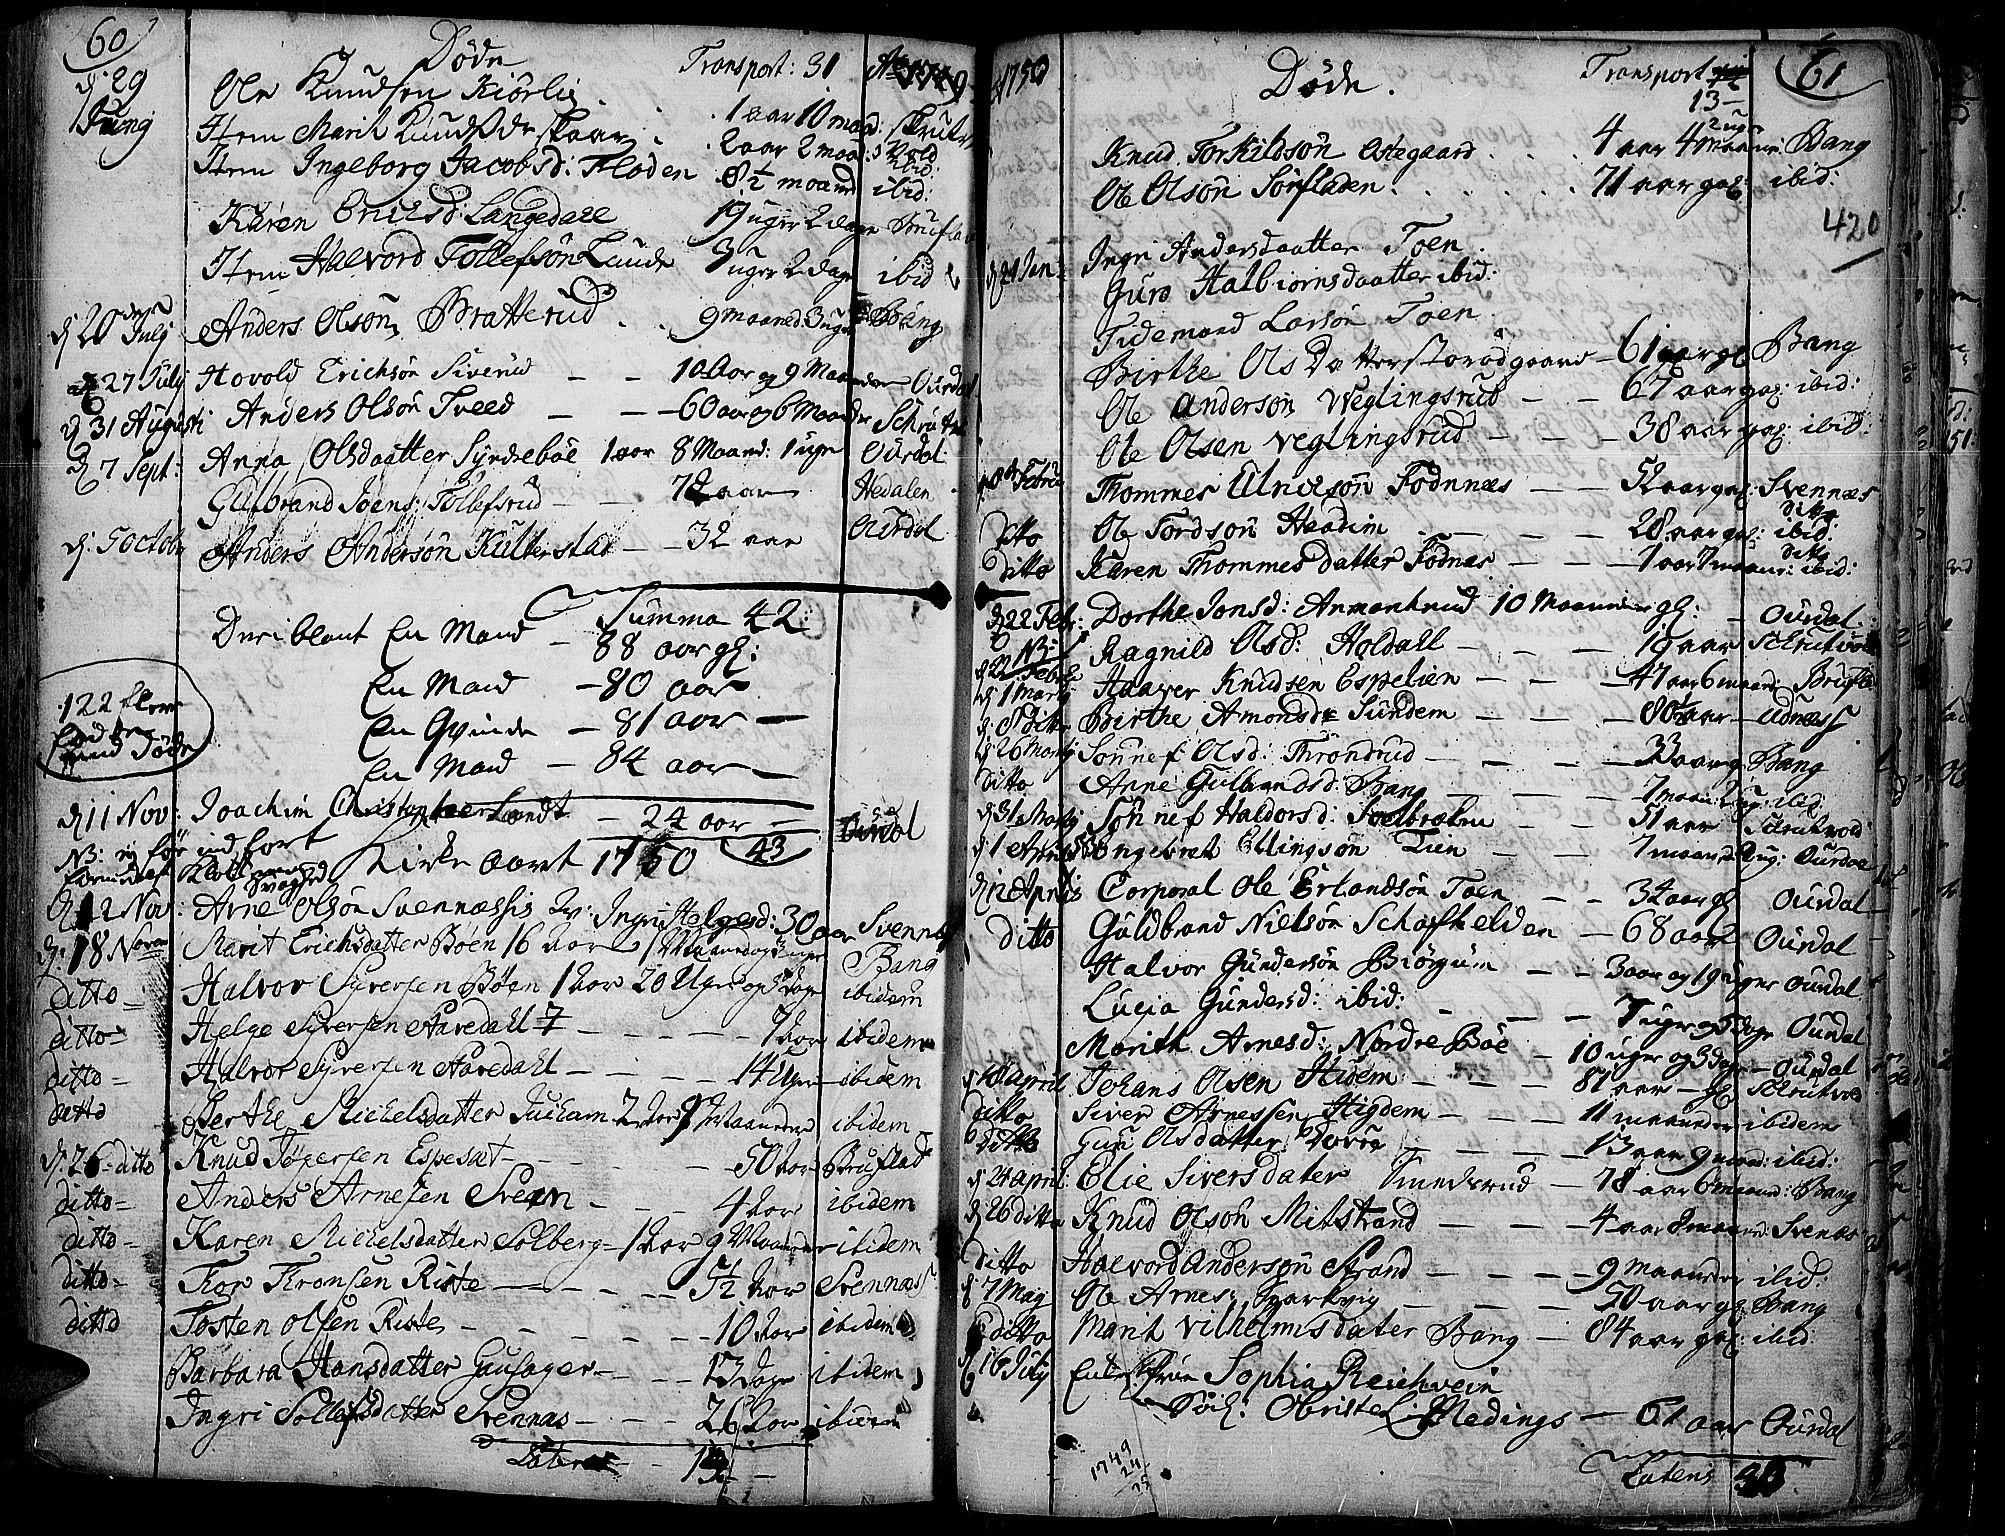 SAH, Aurdal prestekontor, Ministerialbok nr. 4, 1730-1762, s. 60-61